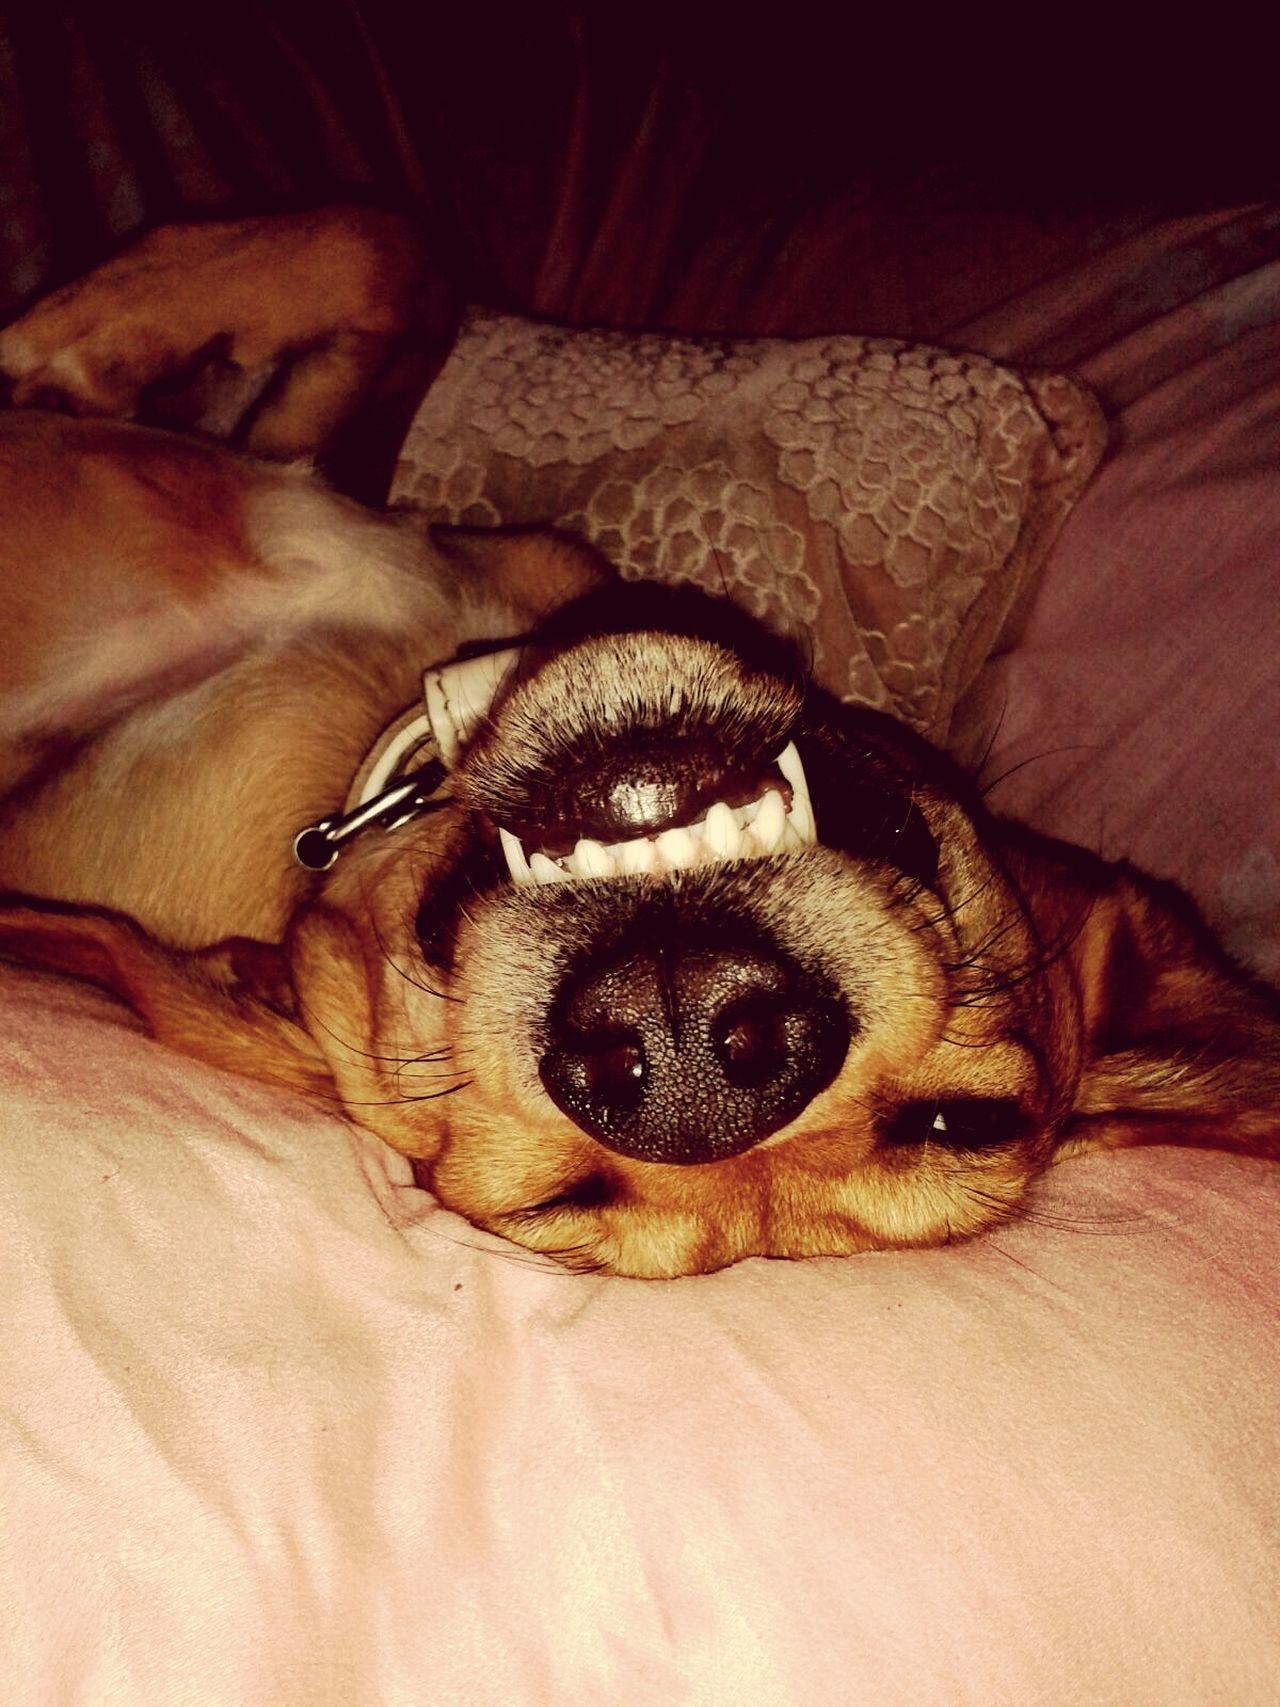 I Love My Dog Dogoftheday Relaxing Enjoying Life Happiness Hollandsnextdogmodel